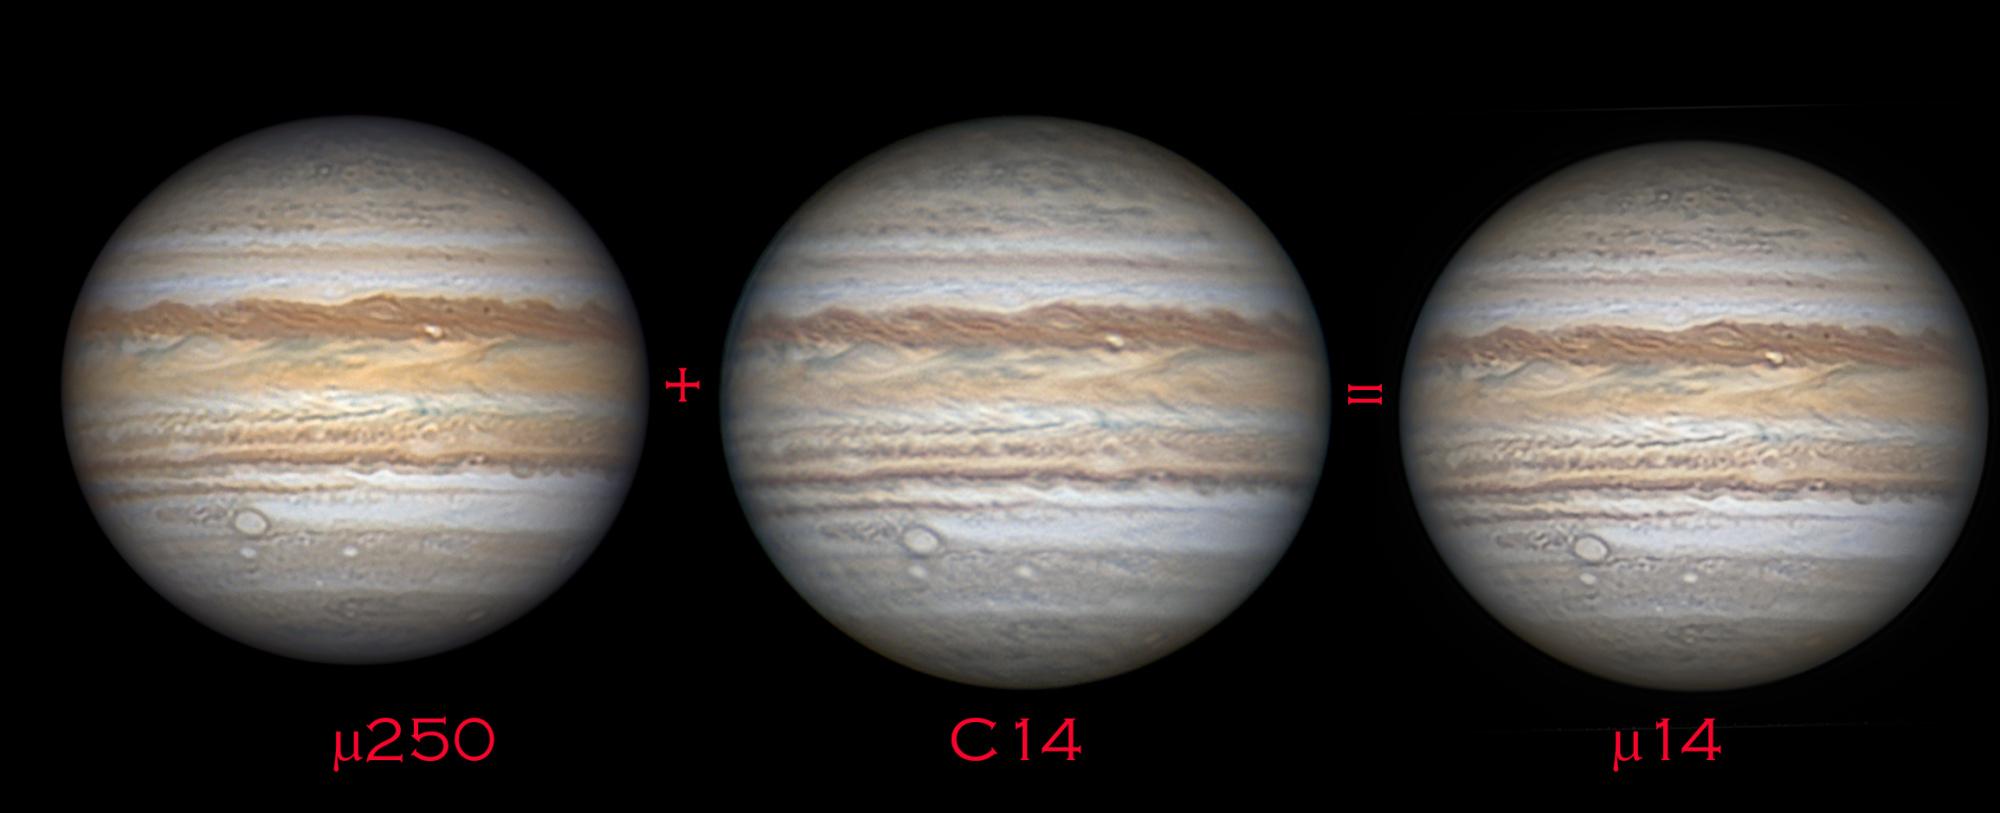 2019-05-31-2351_0-L-Jupiter_ALTAIRGP224C_lapl6_ap117T.thumb.jpg.1f51d7924808e933e20849ce2c2f5c17.jpg